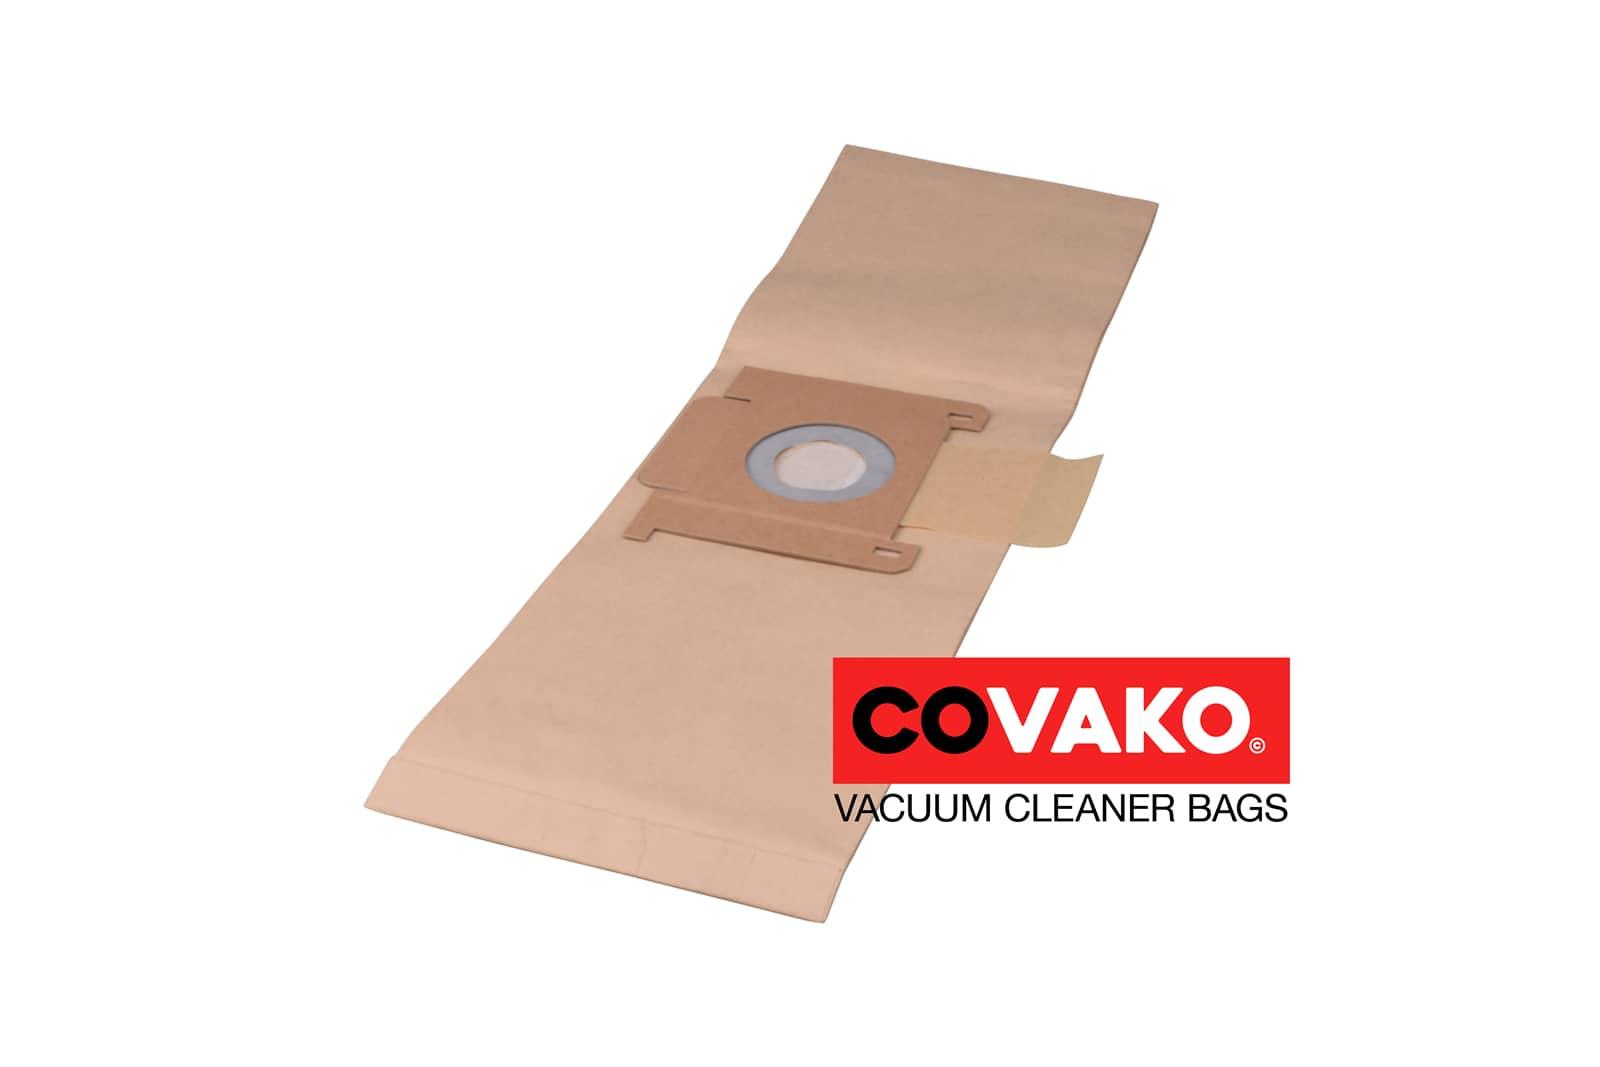 Fast C 5 / Papier - Fast stofzuigerzakken